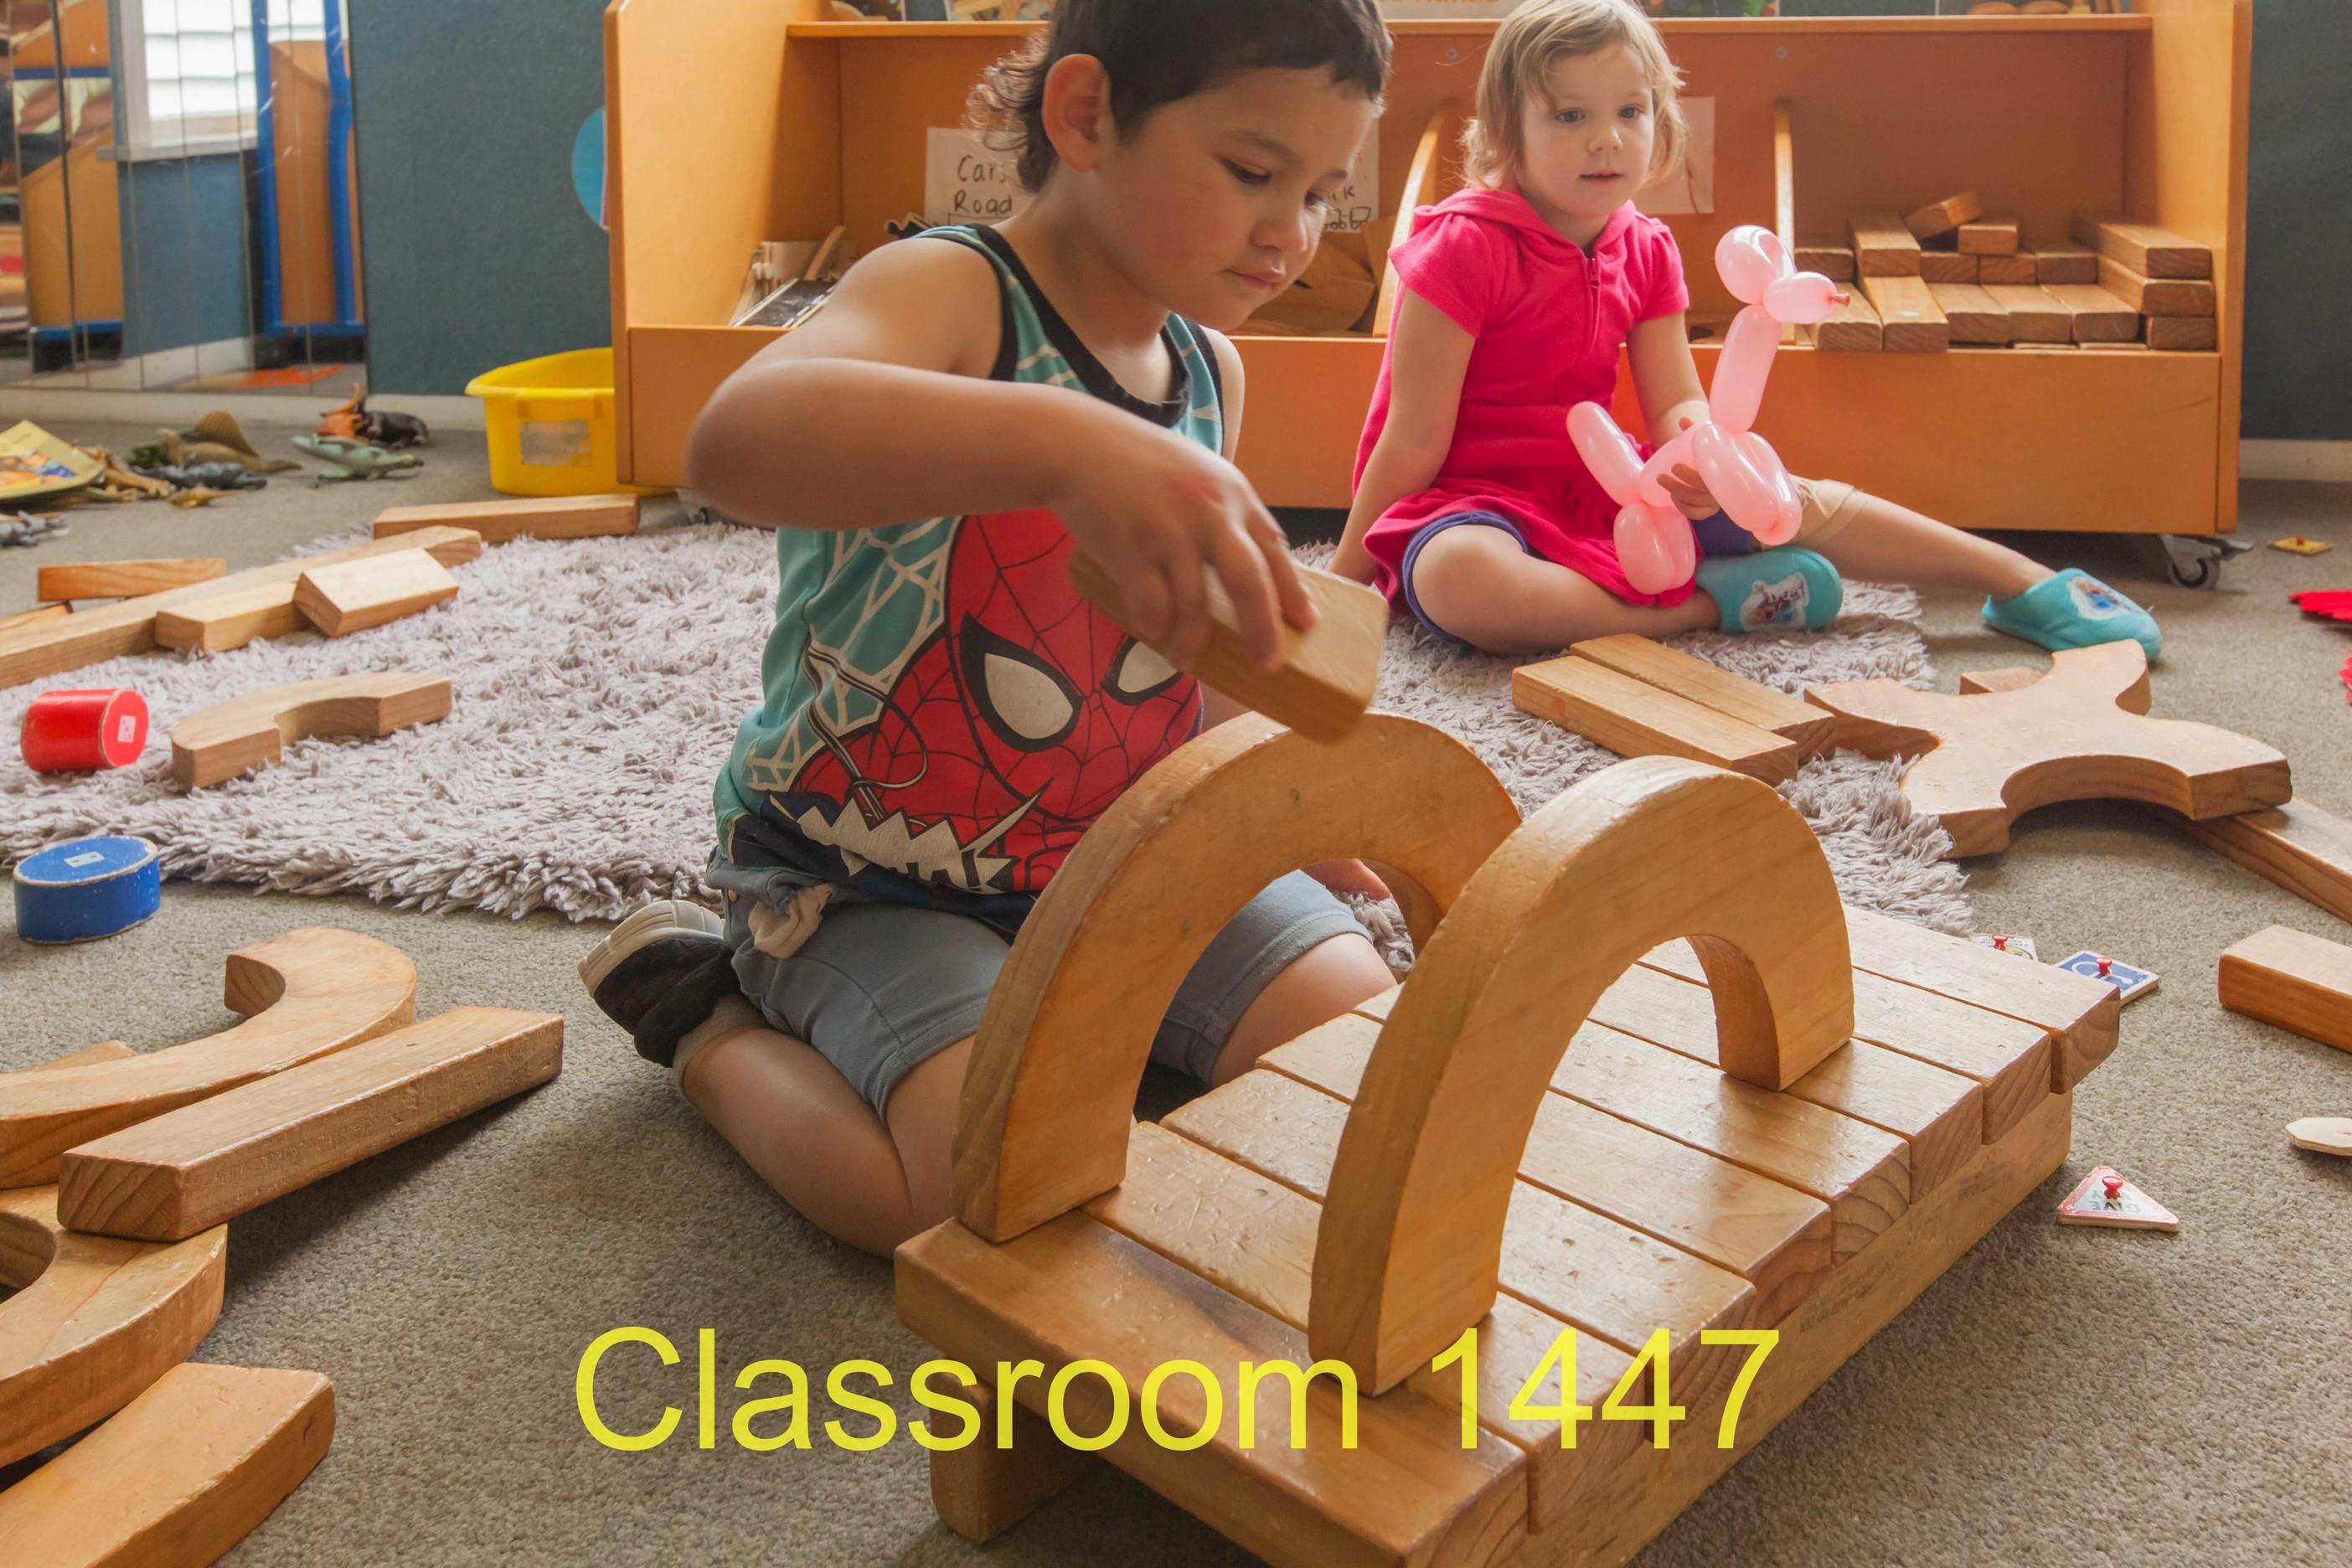 Classroom 1447